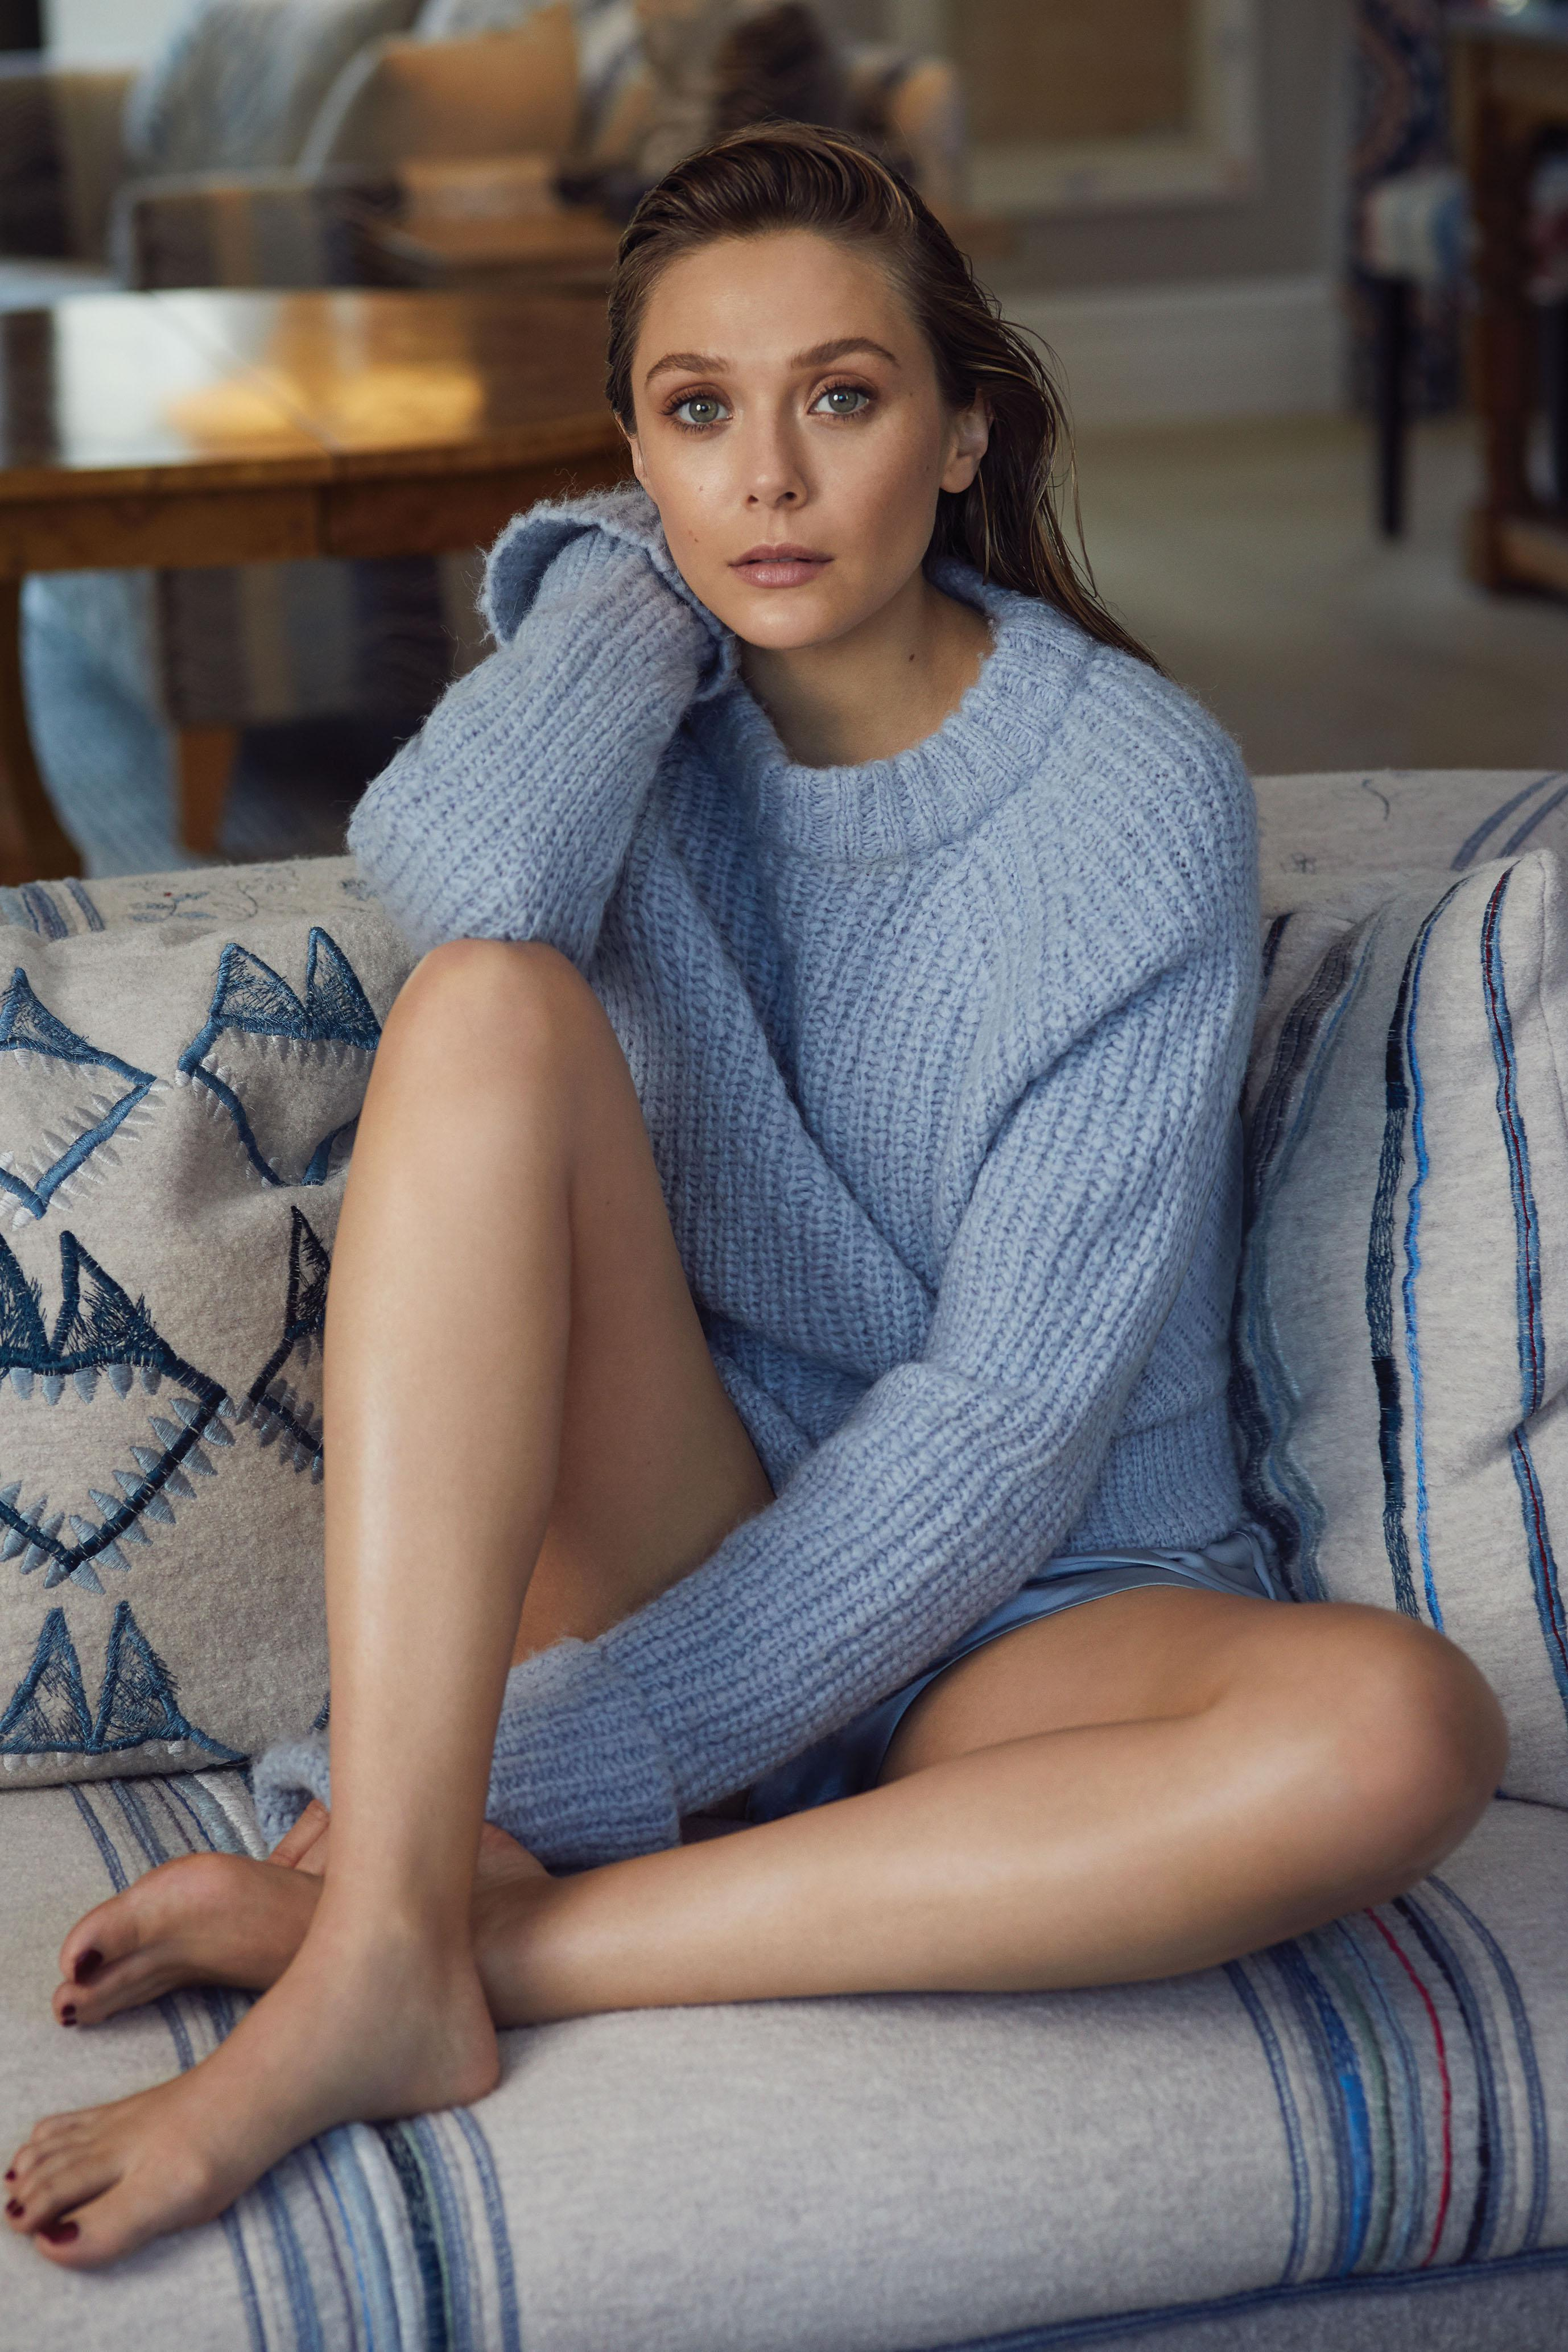 Feet Elizabeth Olsen nude photos 2019